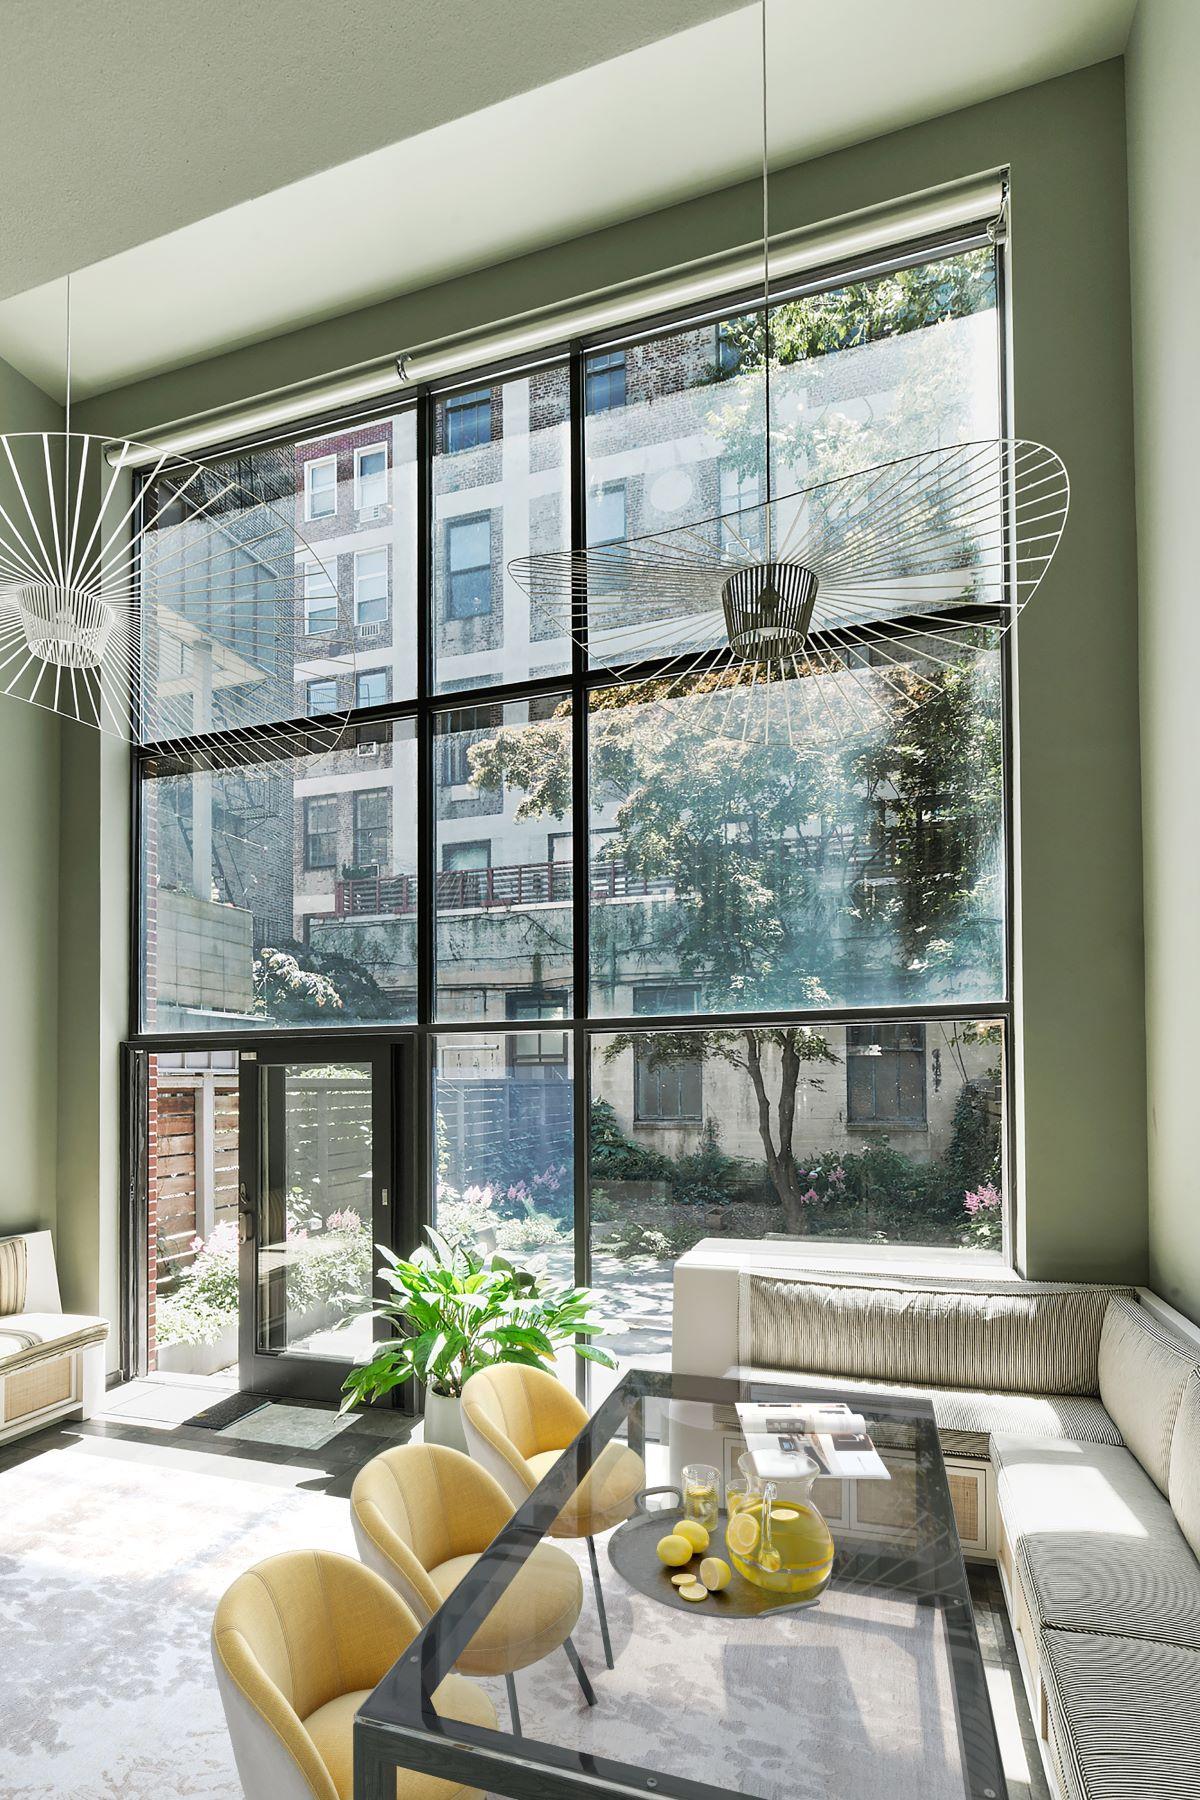 townhouses 為 出售 在 Boerum Hill Beauty 418 State Street, Brooklyn, 纽约 11217 美國